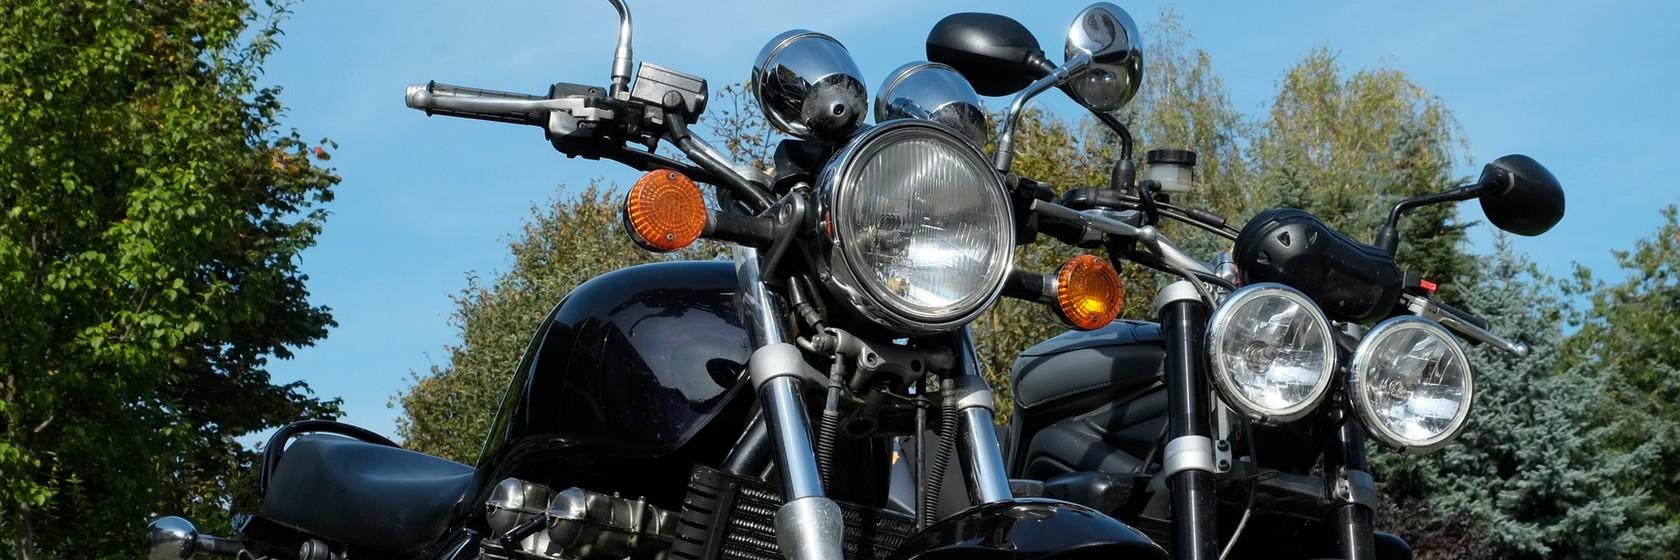 über Motorräder